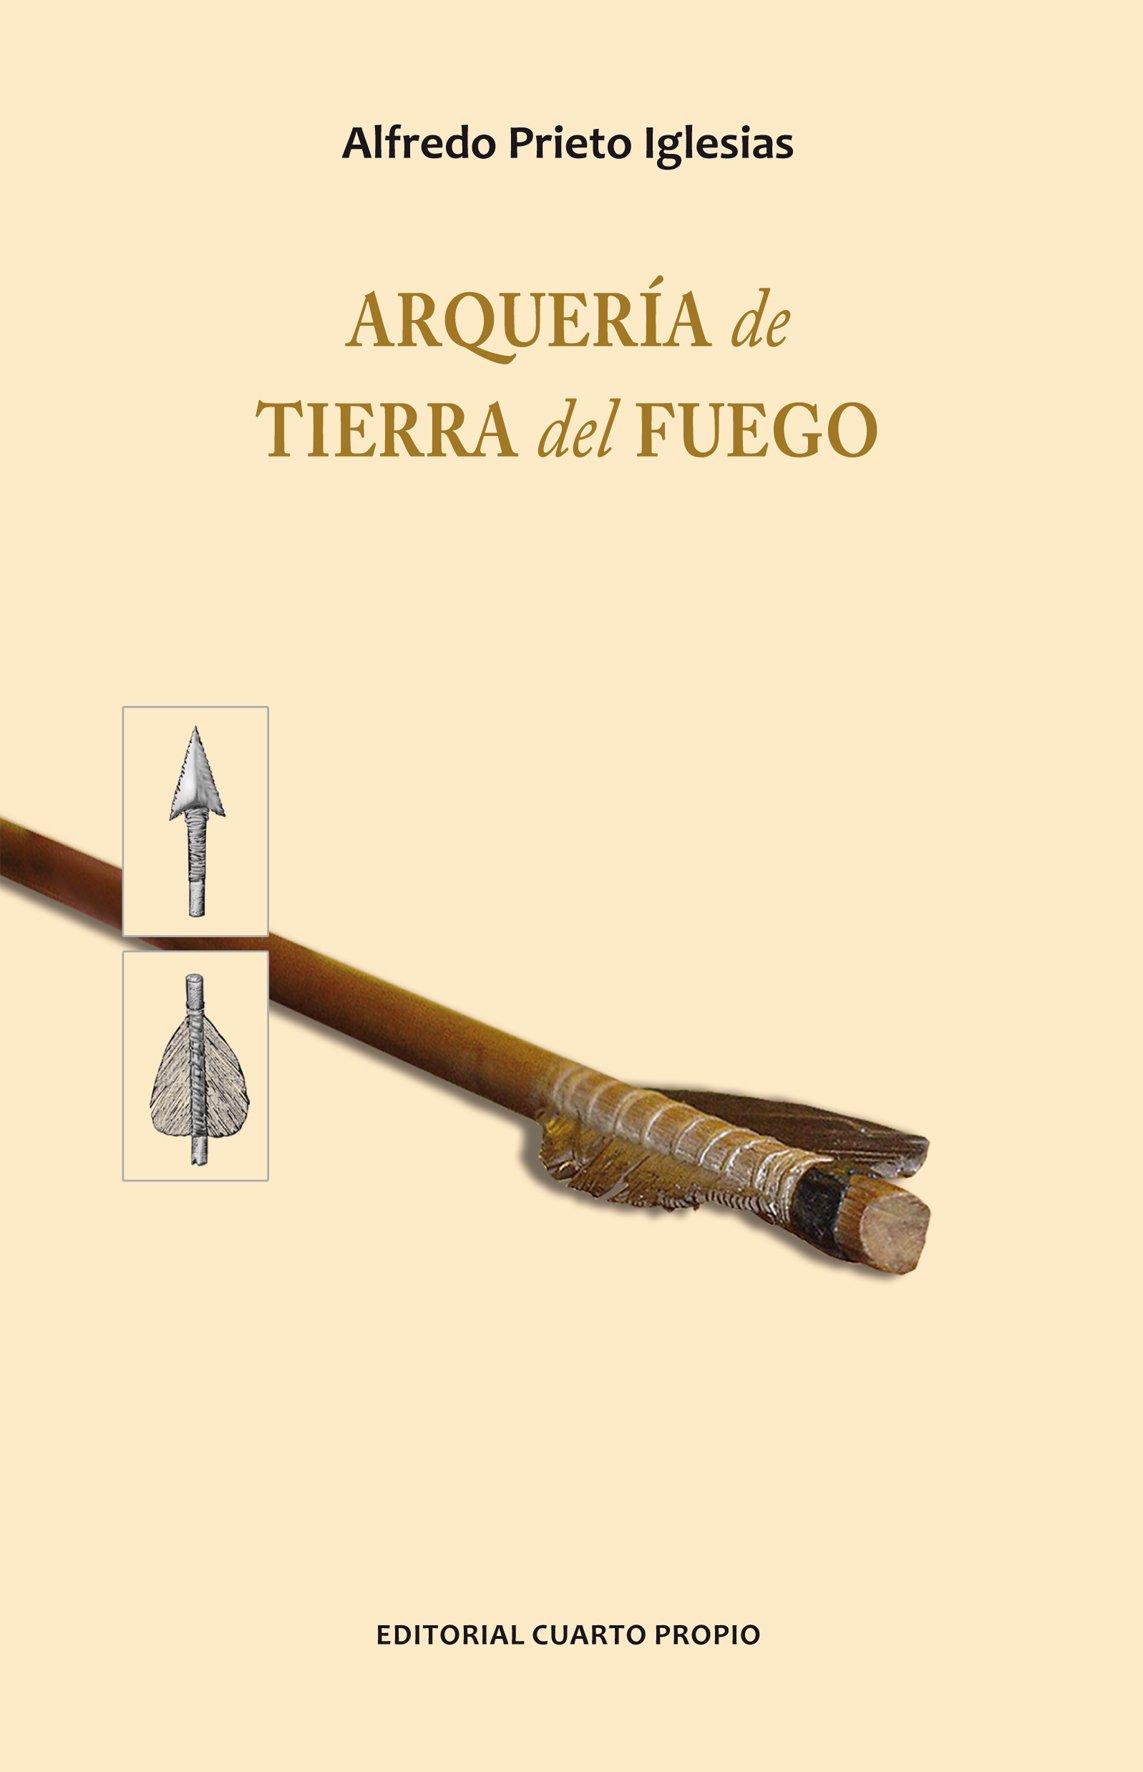 ARQUERÍA DE TIERRA DE FUEGO: Alfredo Prieto Iglesias: 9789562605496: Amazon.com: Books